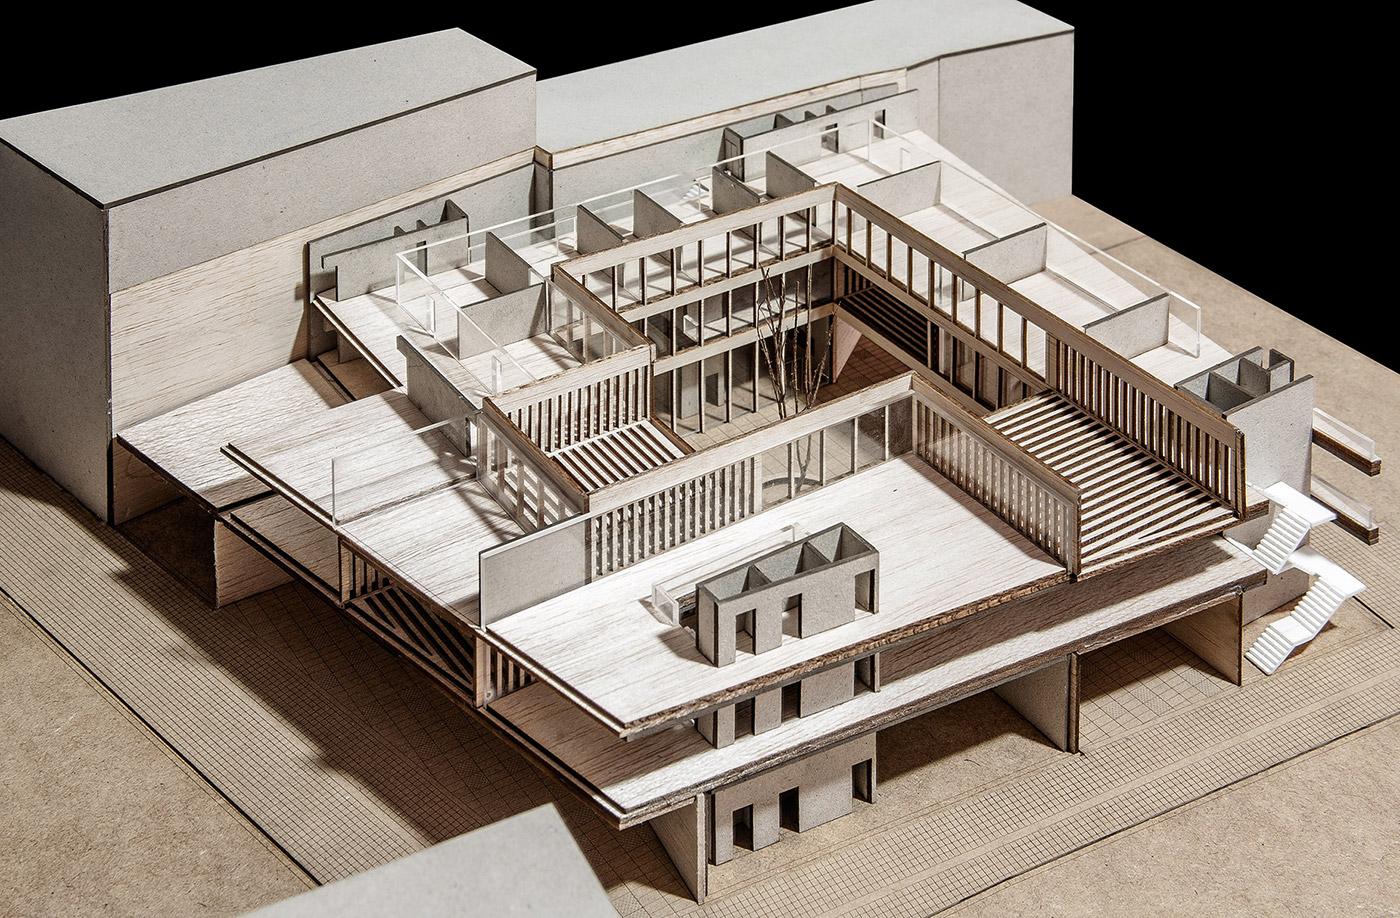 maqueta arquitectura museo arquimaqueta